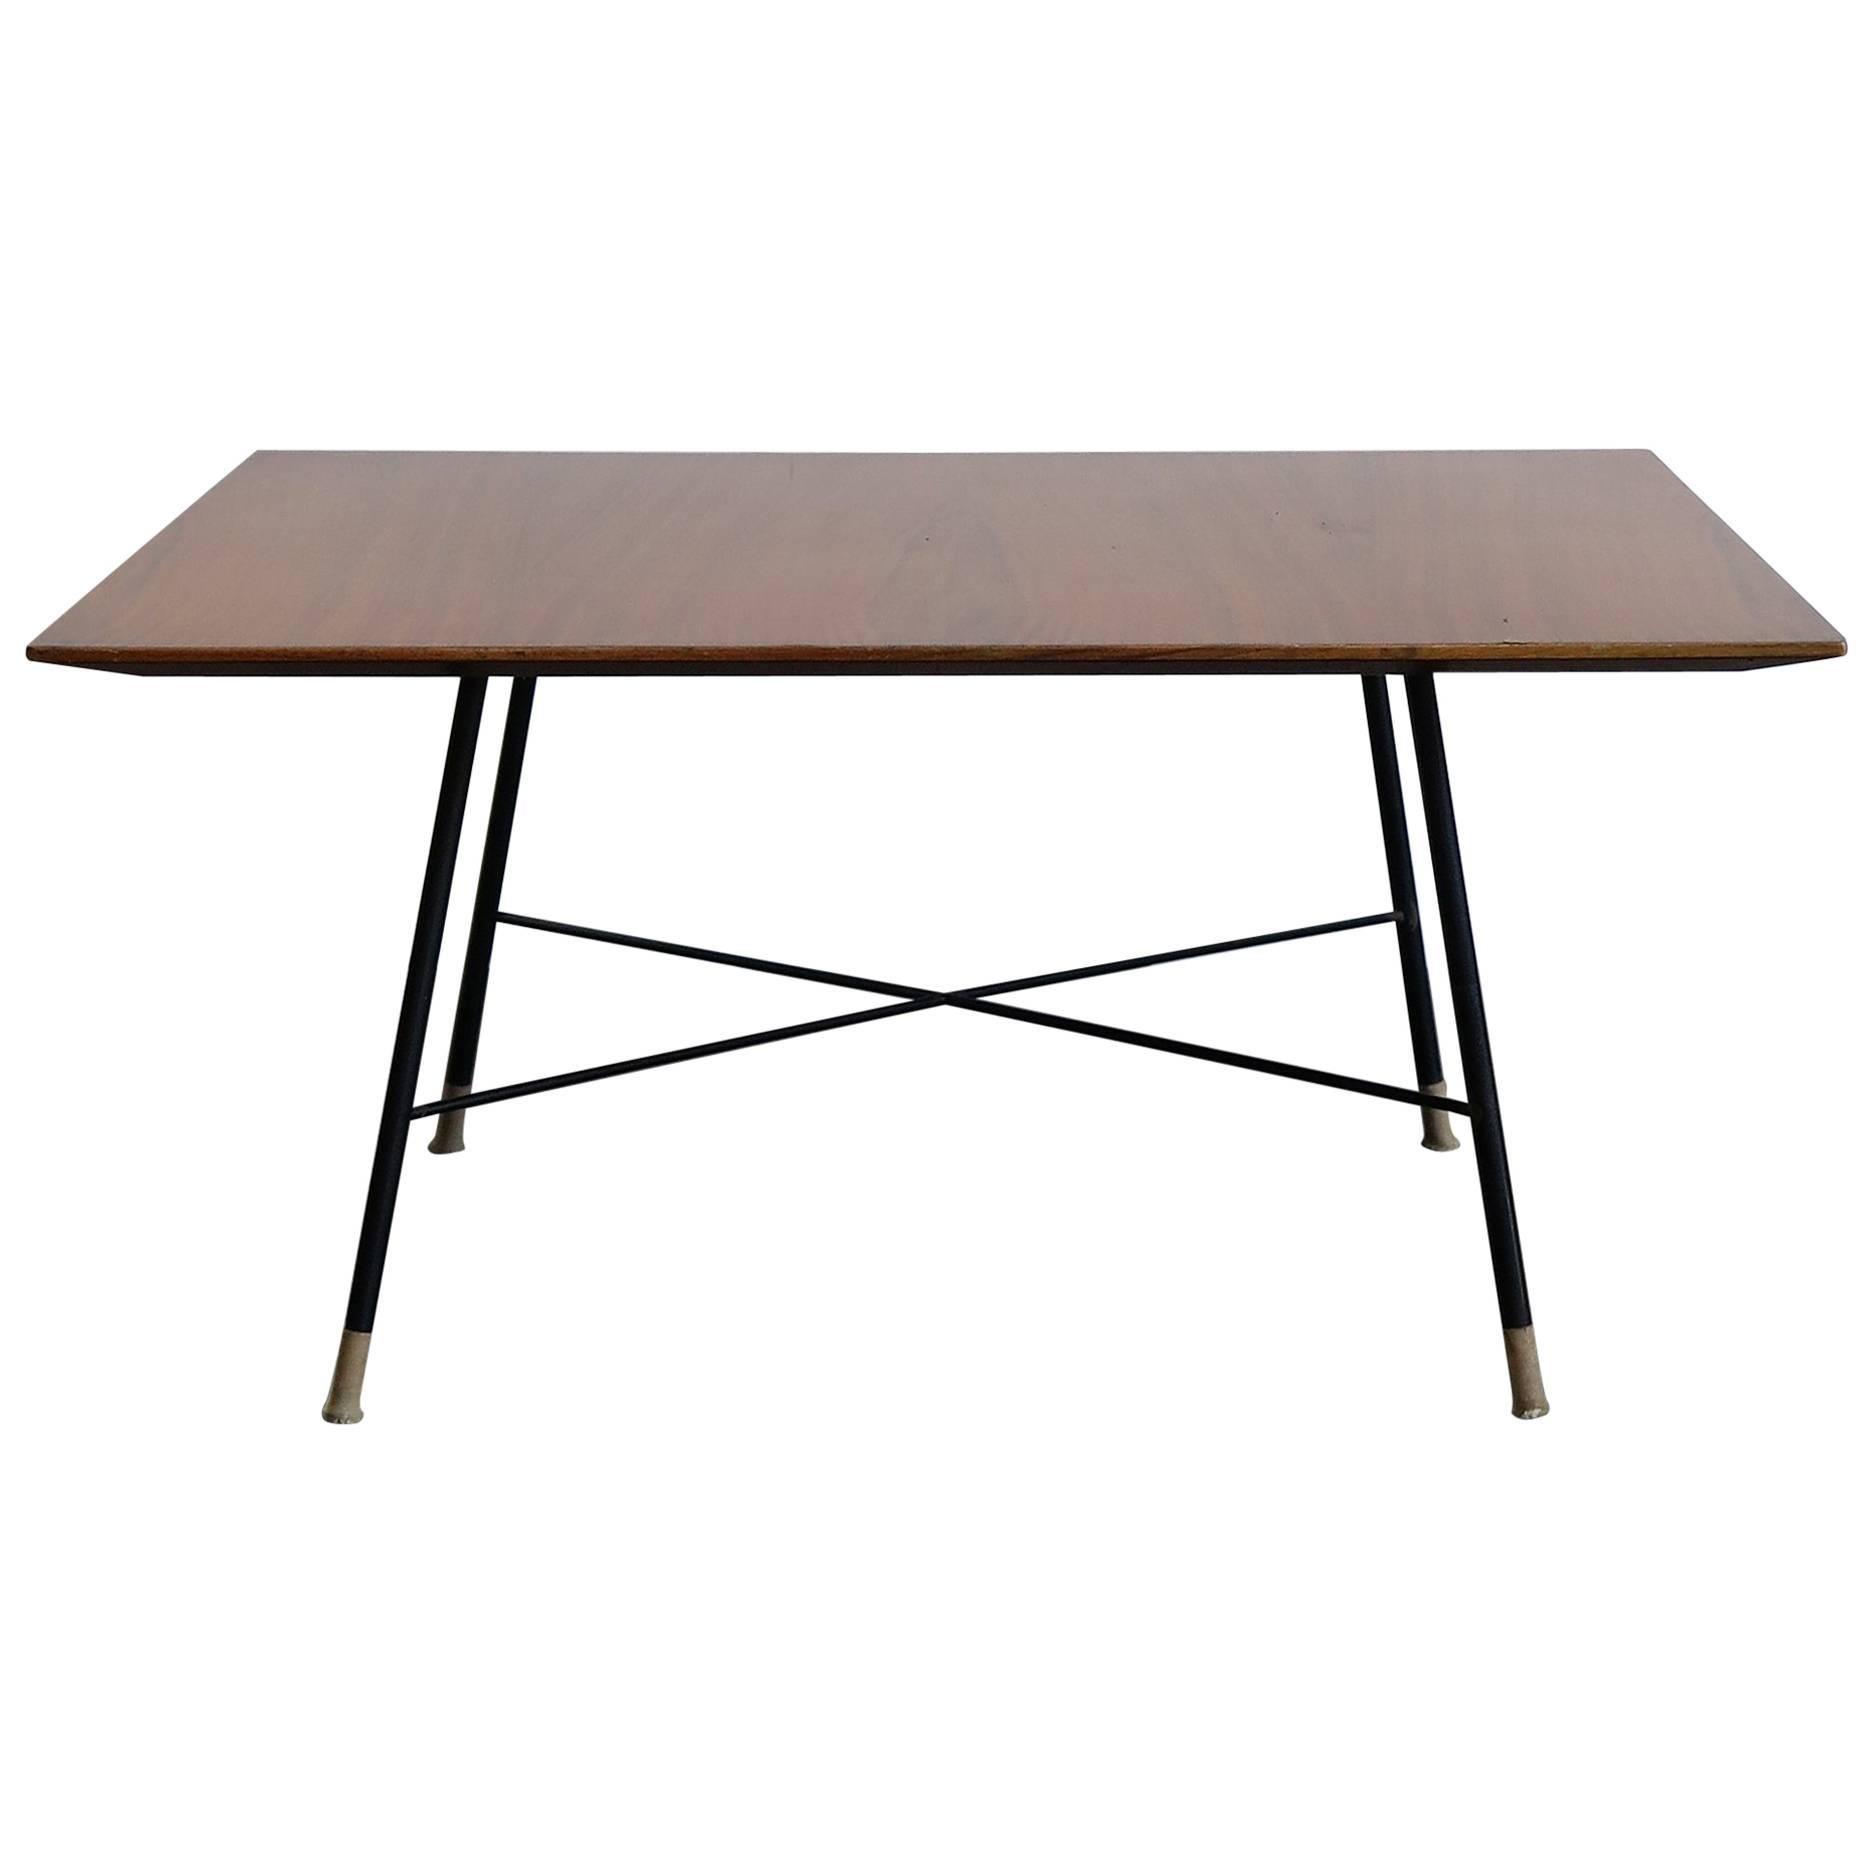 1950s Ico Parisi Midcentury Modern Square Wood Metal Coffee Table